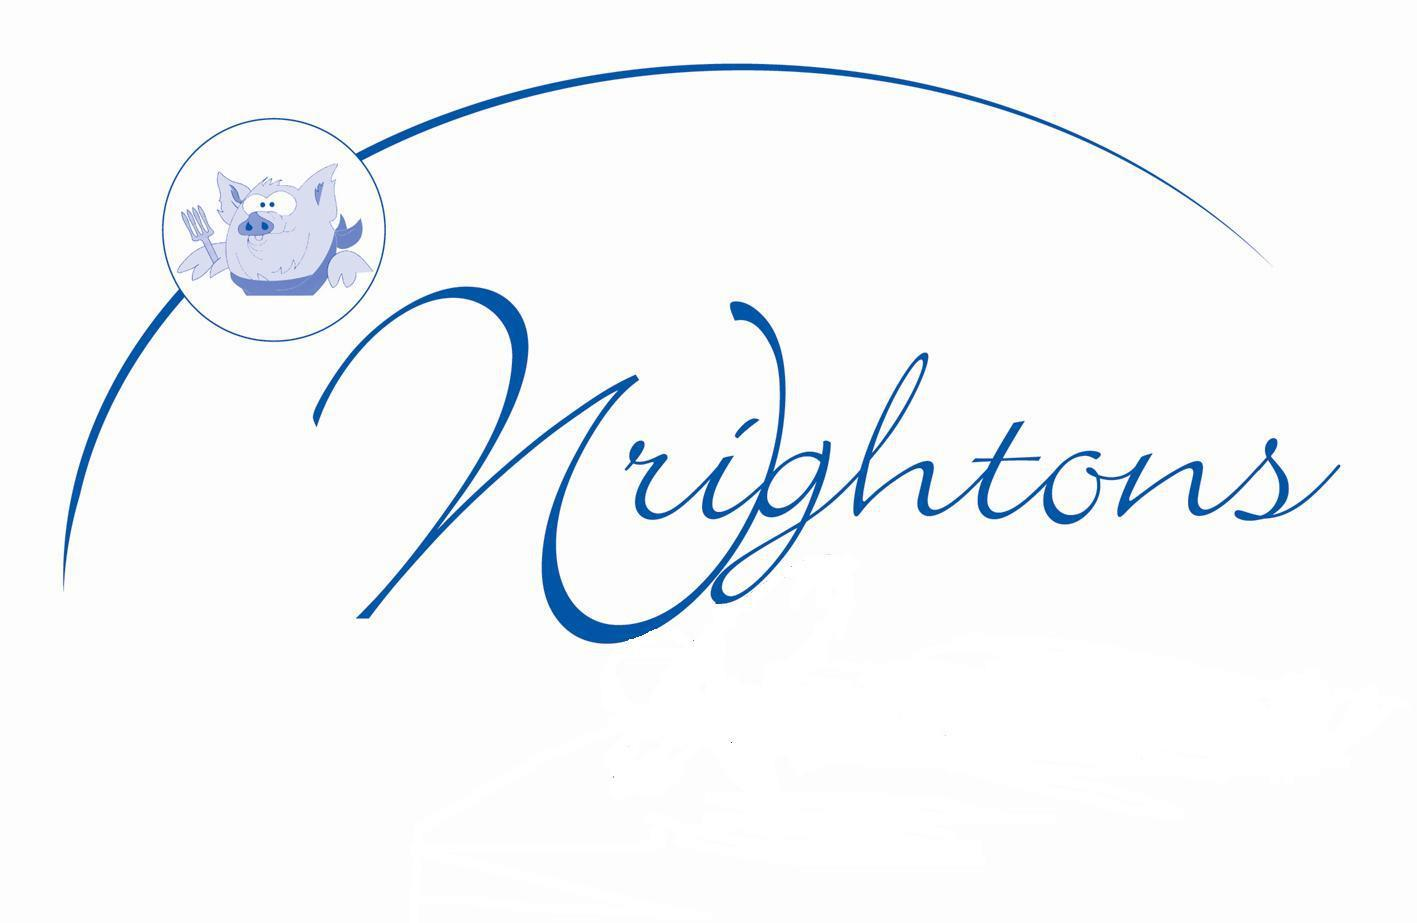 G.B.Wrightons